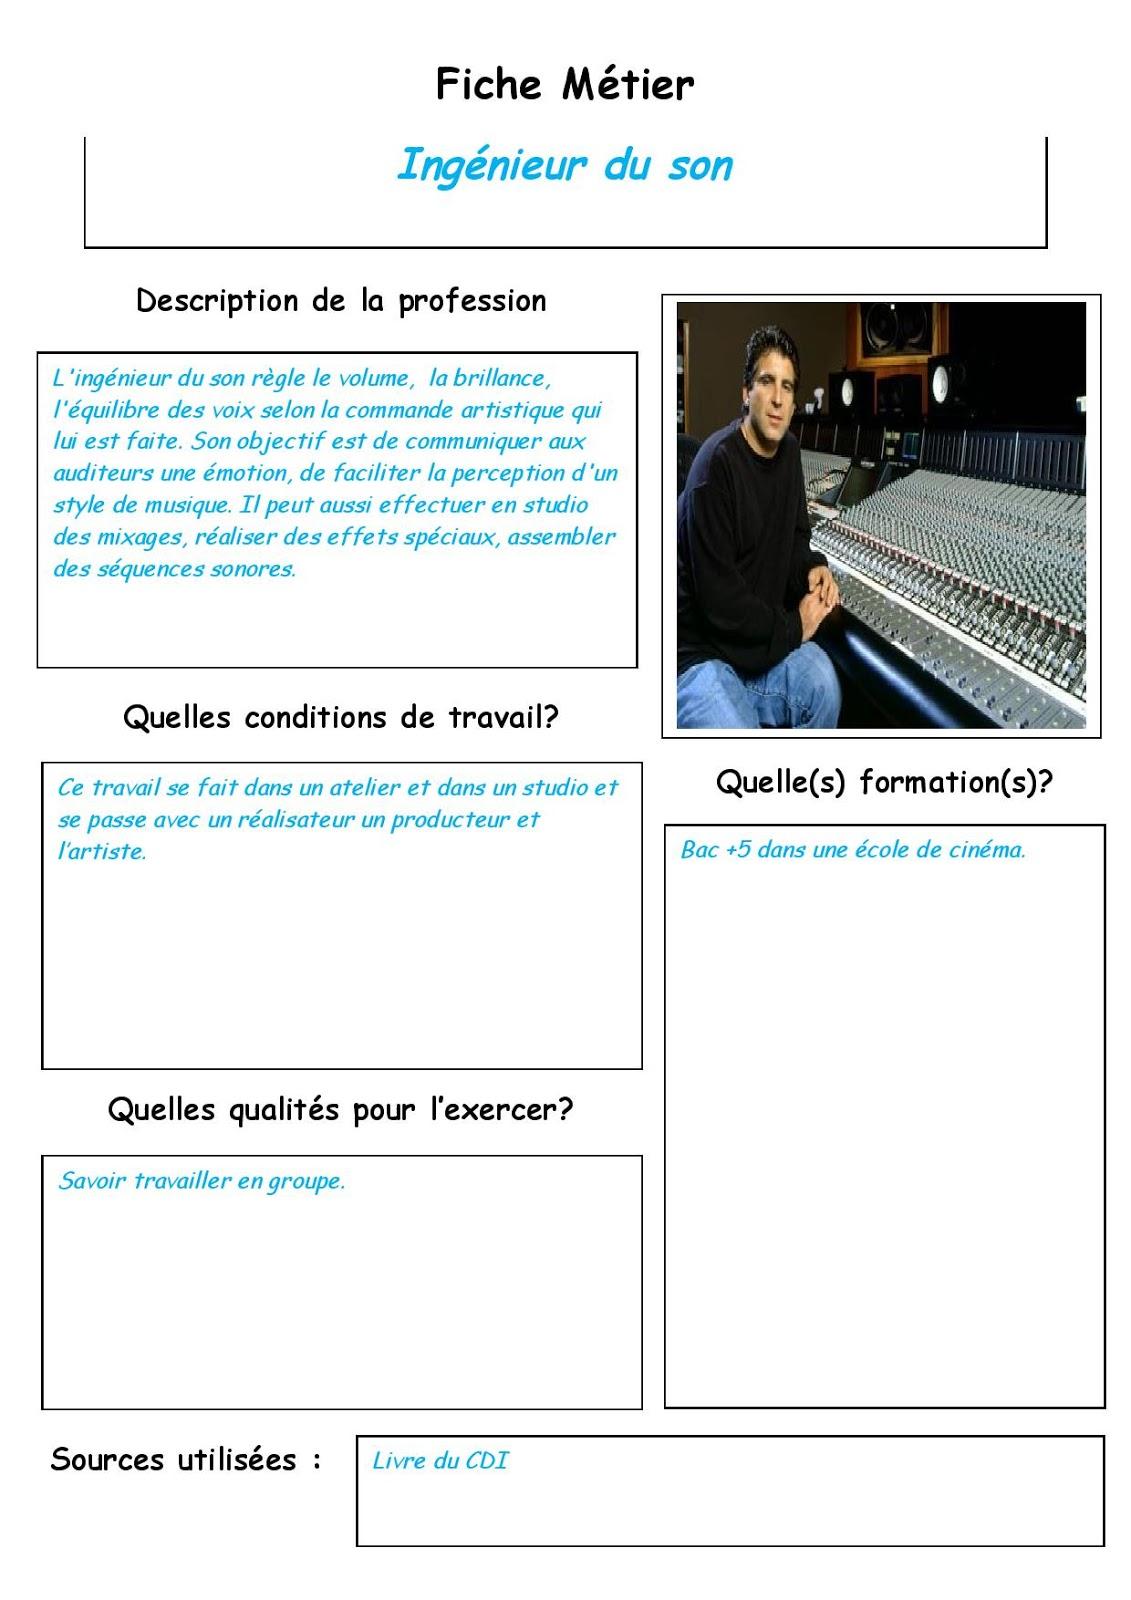 Classe Media Fiche Metier Ingenieur Du Son